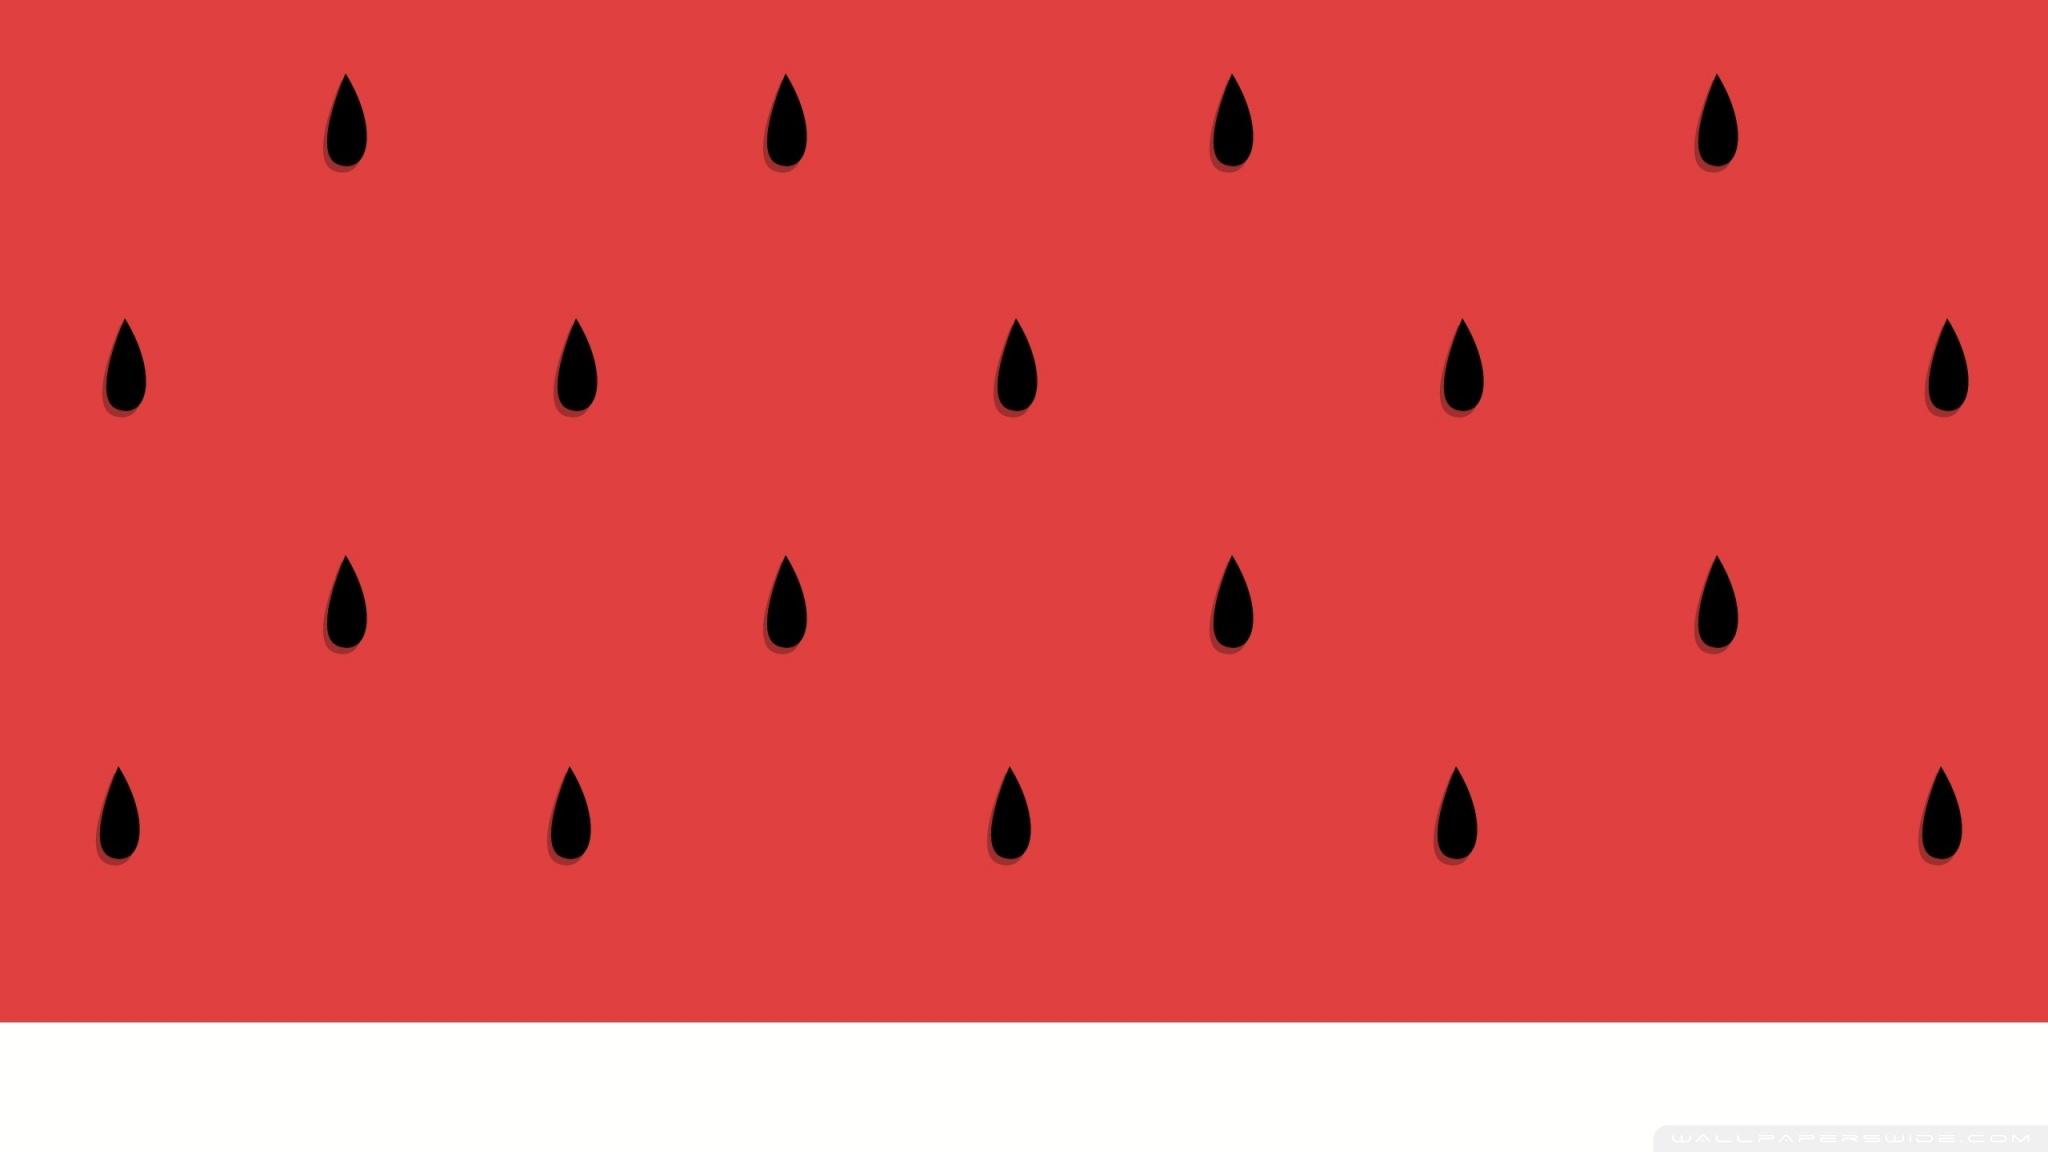 Airplane Wallpaper Iphone X Watermelon Background 4k Hd Desktop Wallpaper For 4k Ultra